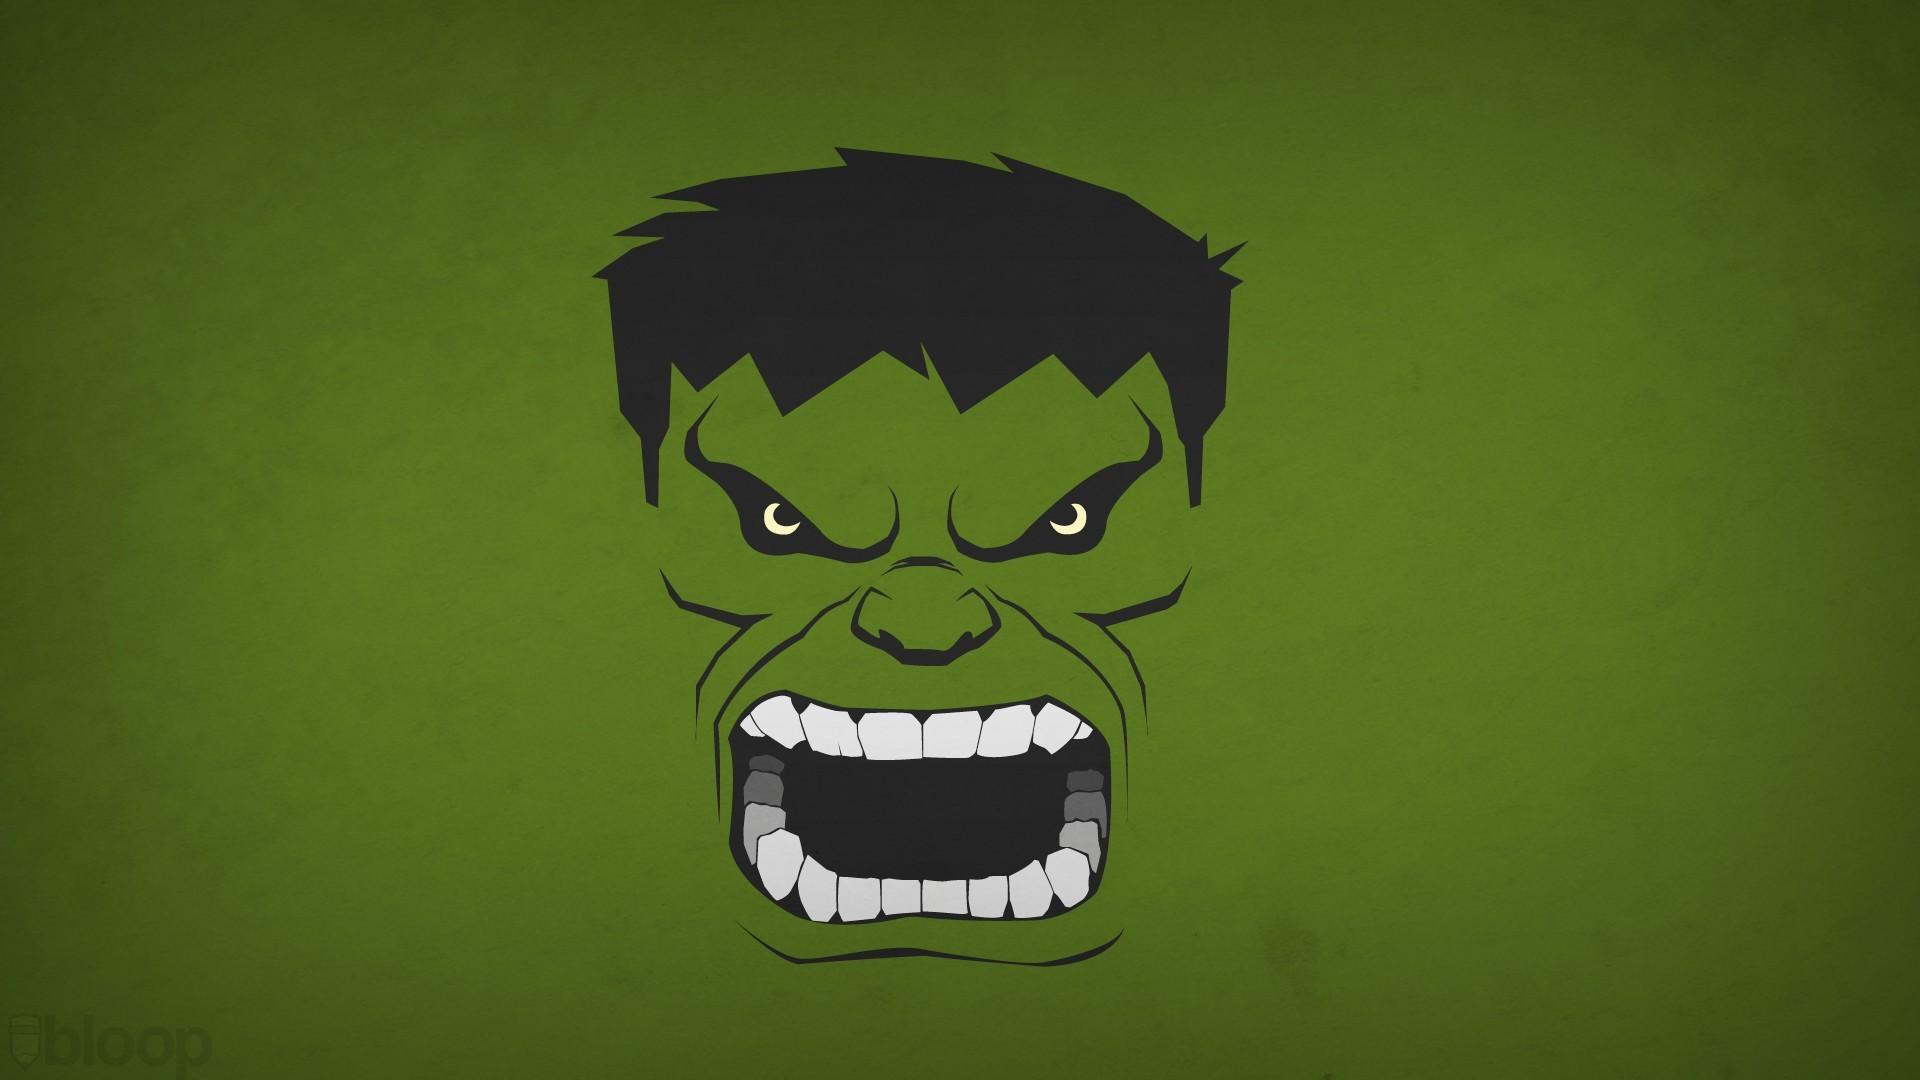 Simple Wallpaper Marvel Face - drawing-illustration-green-cartoon-hero-superhero-Hulk-comics-Blo0p-sketch-screenshot-computer-wallpaper-236602  You Should Have_928563.jpg